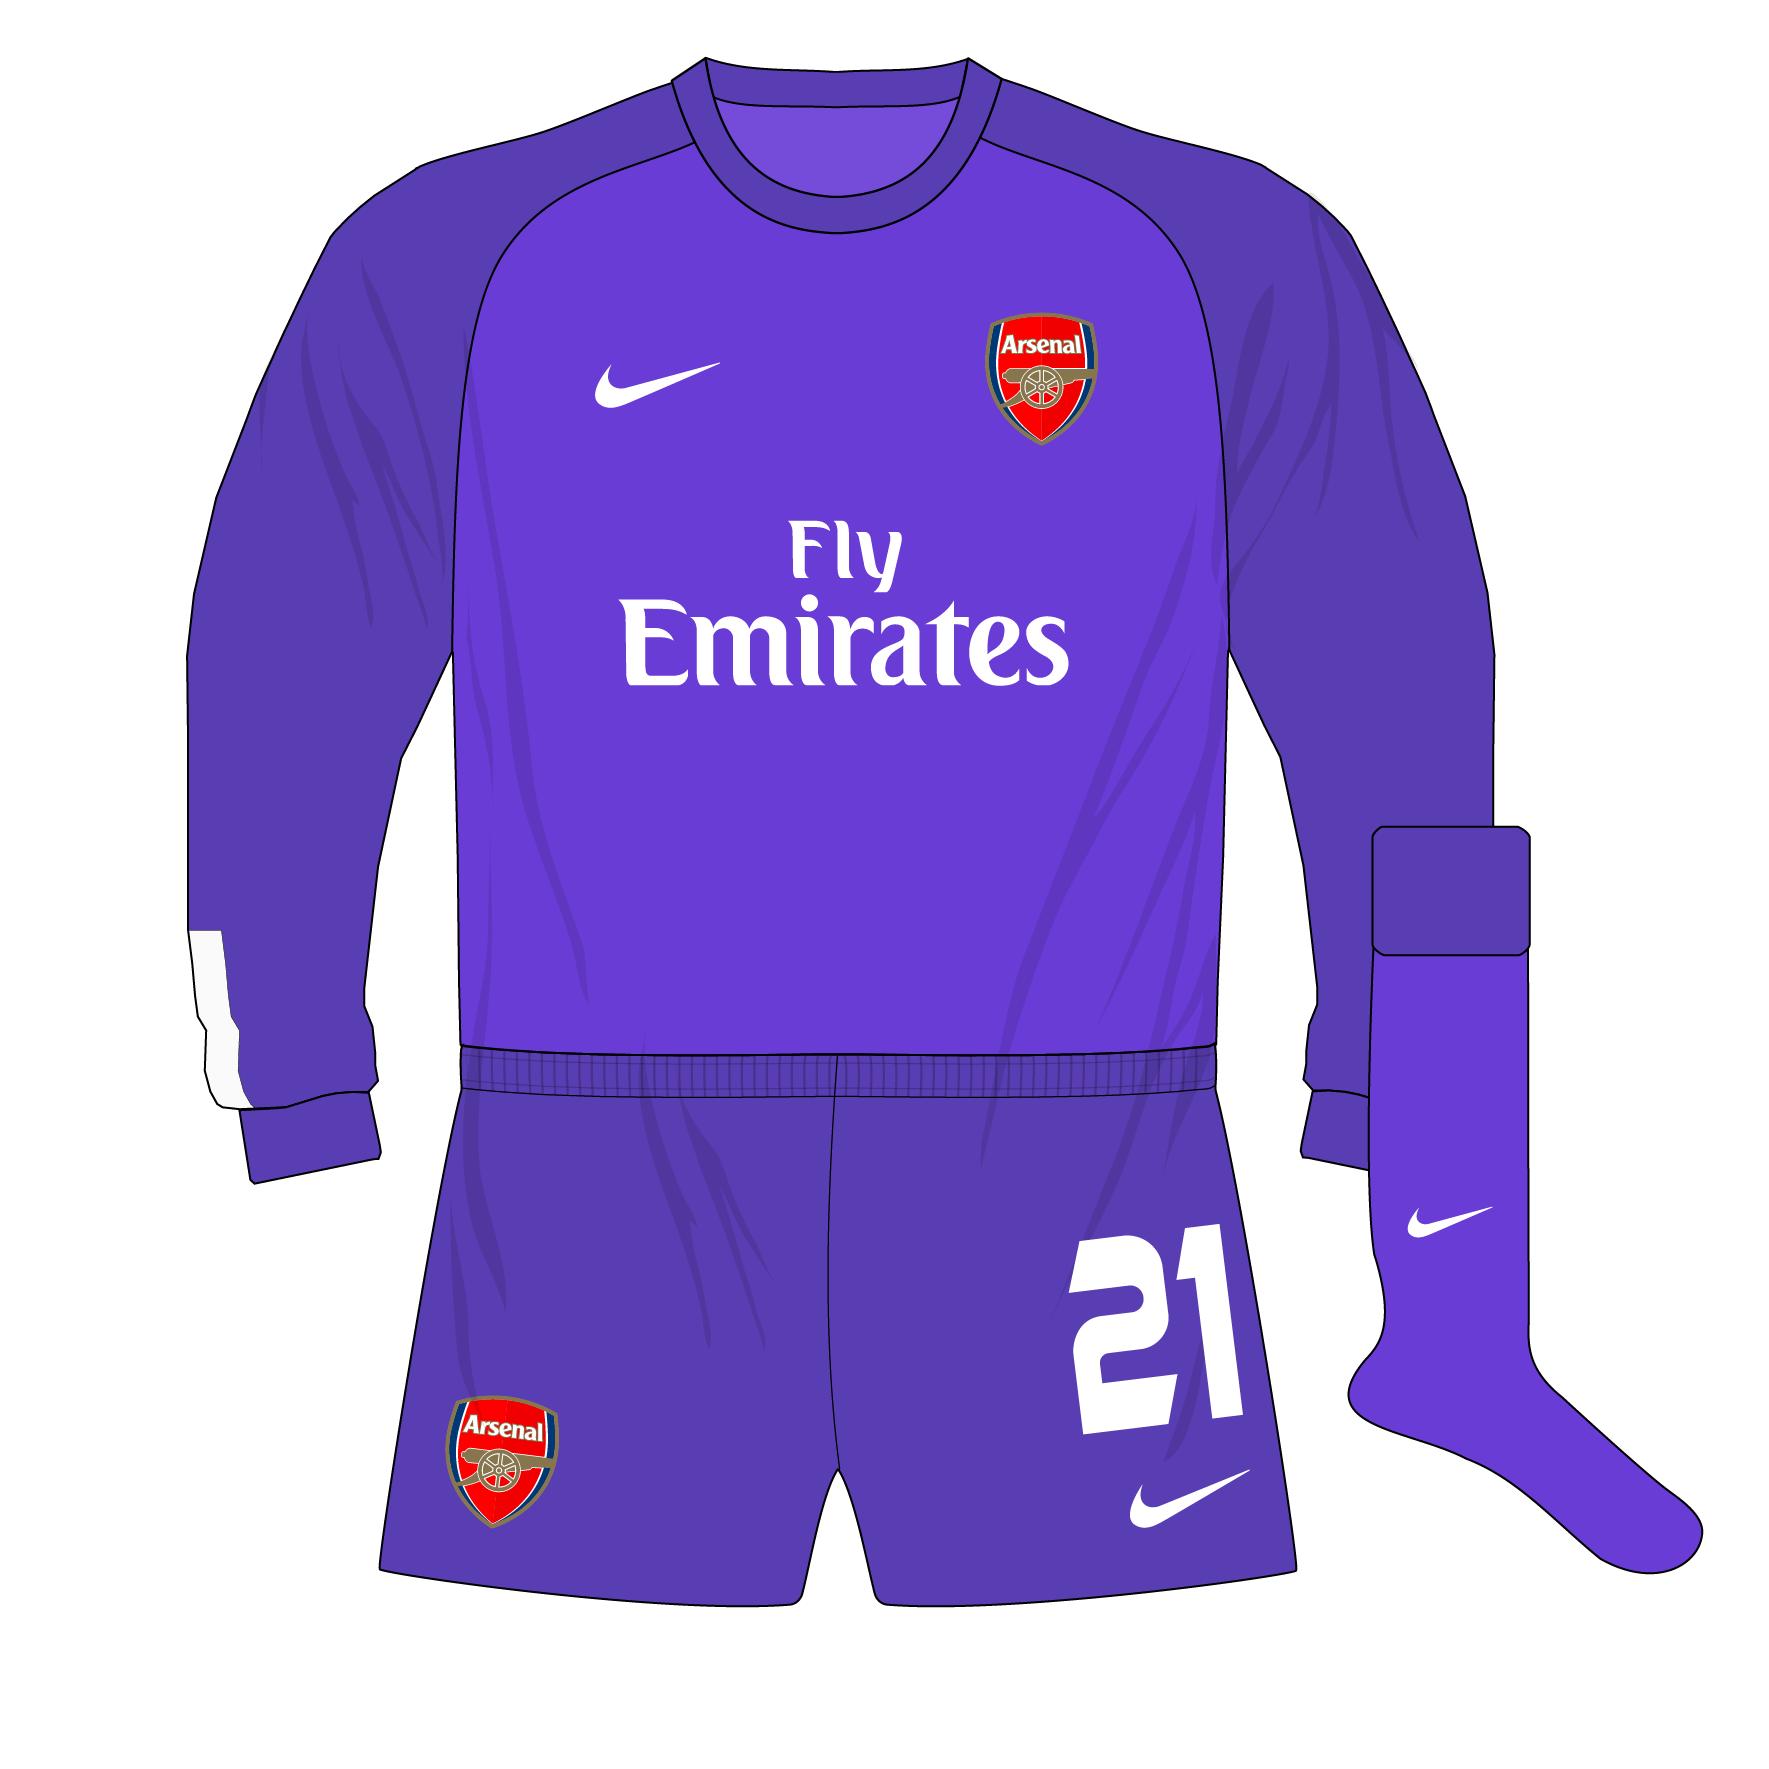 18b125a43e4 Arsenal-Nike-2013-2014-purple-goalkeeper-shirt-kit-Fabianski-01 ...